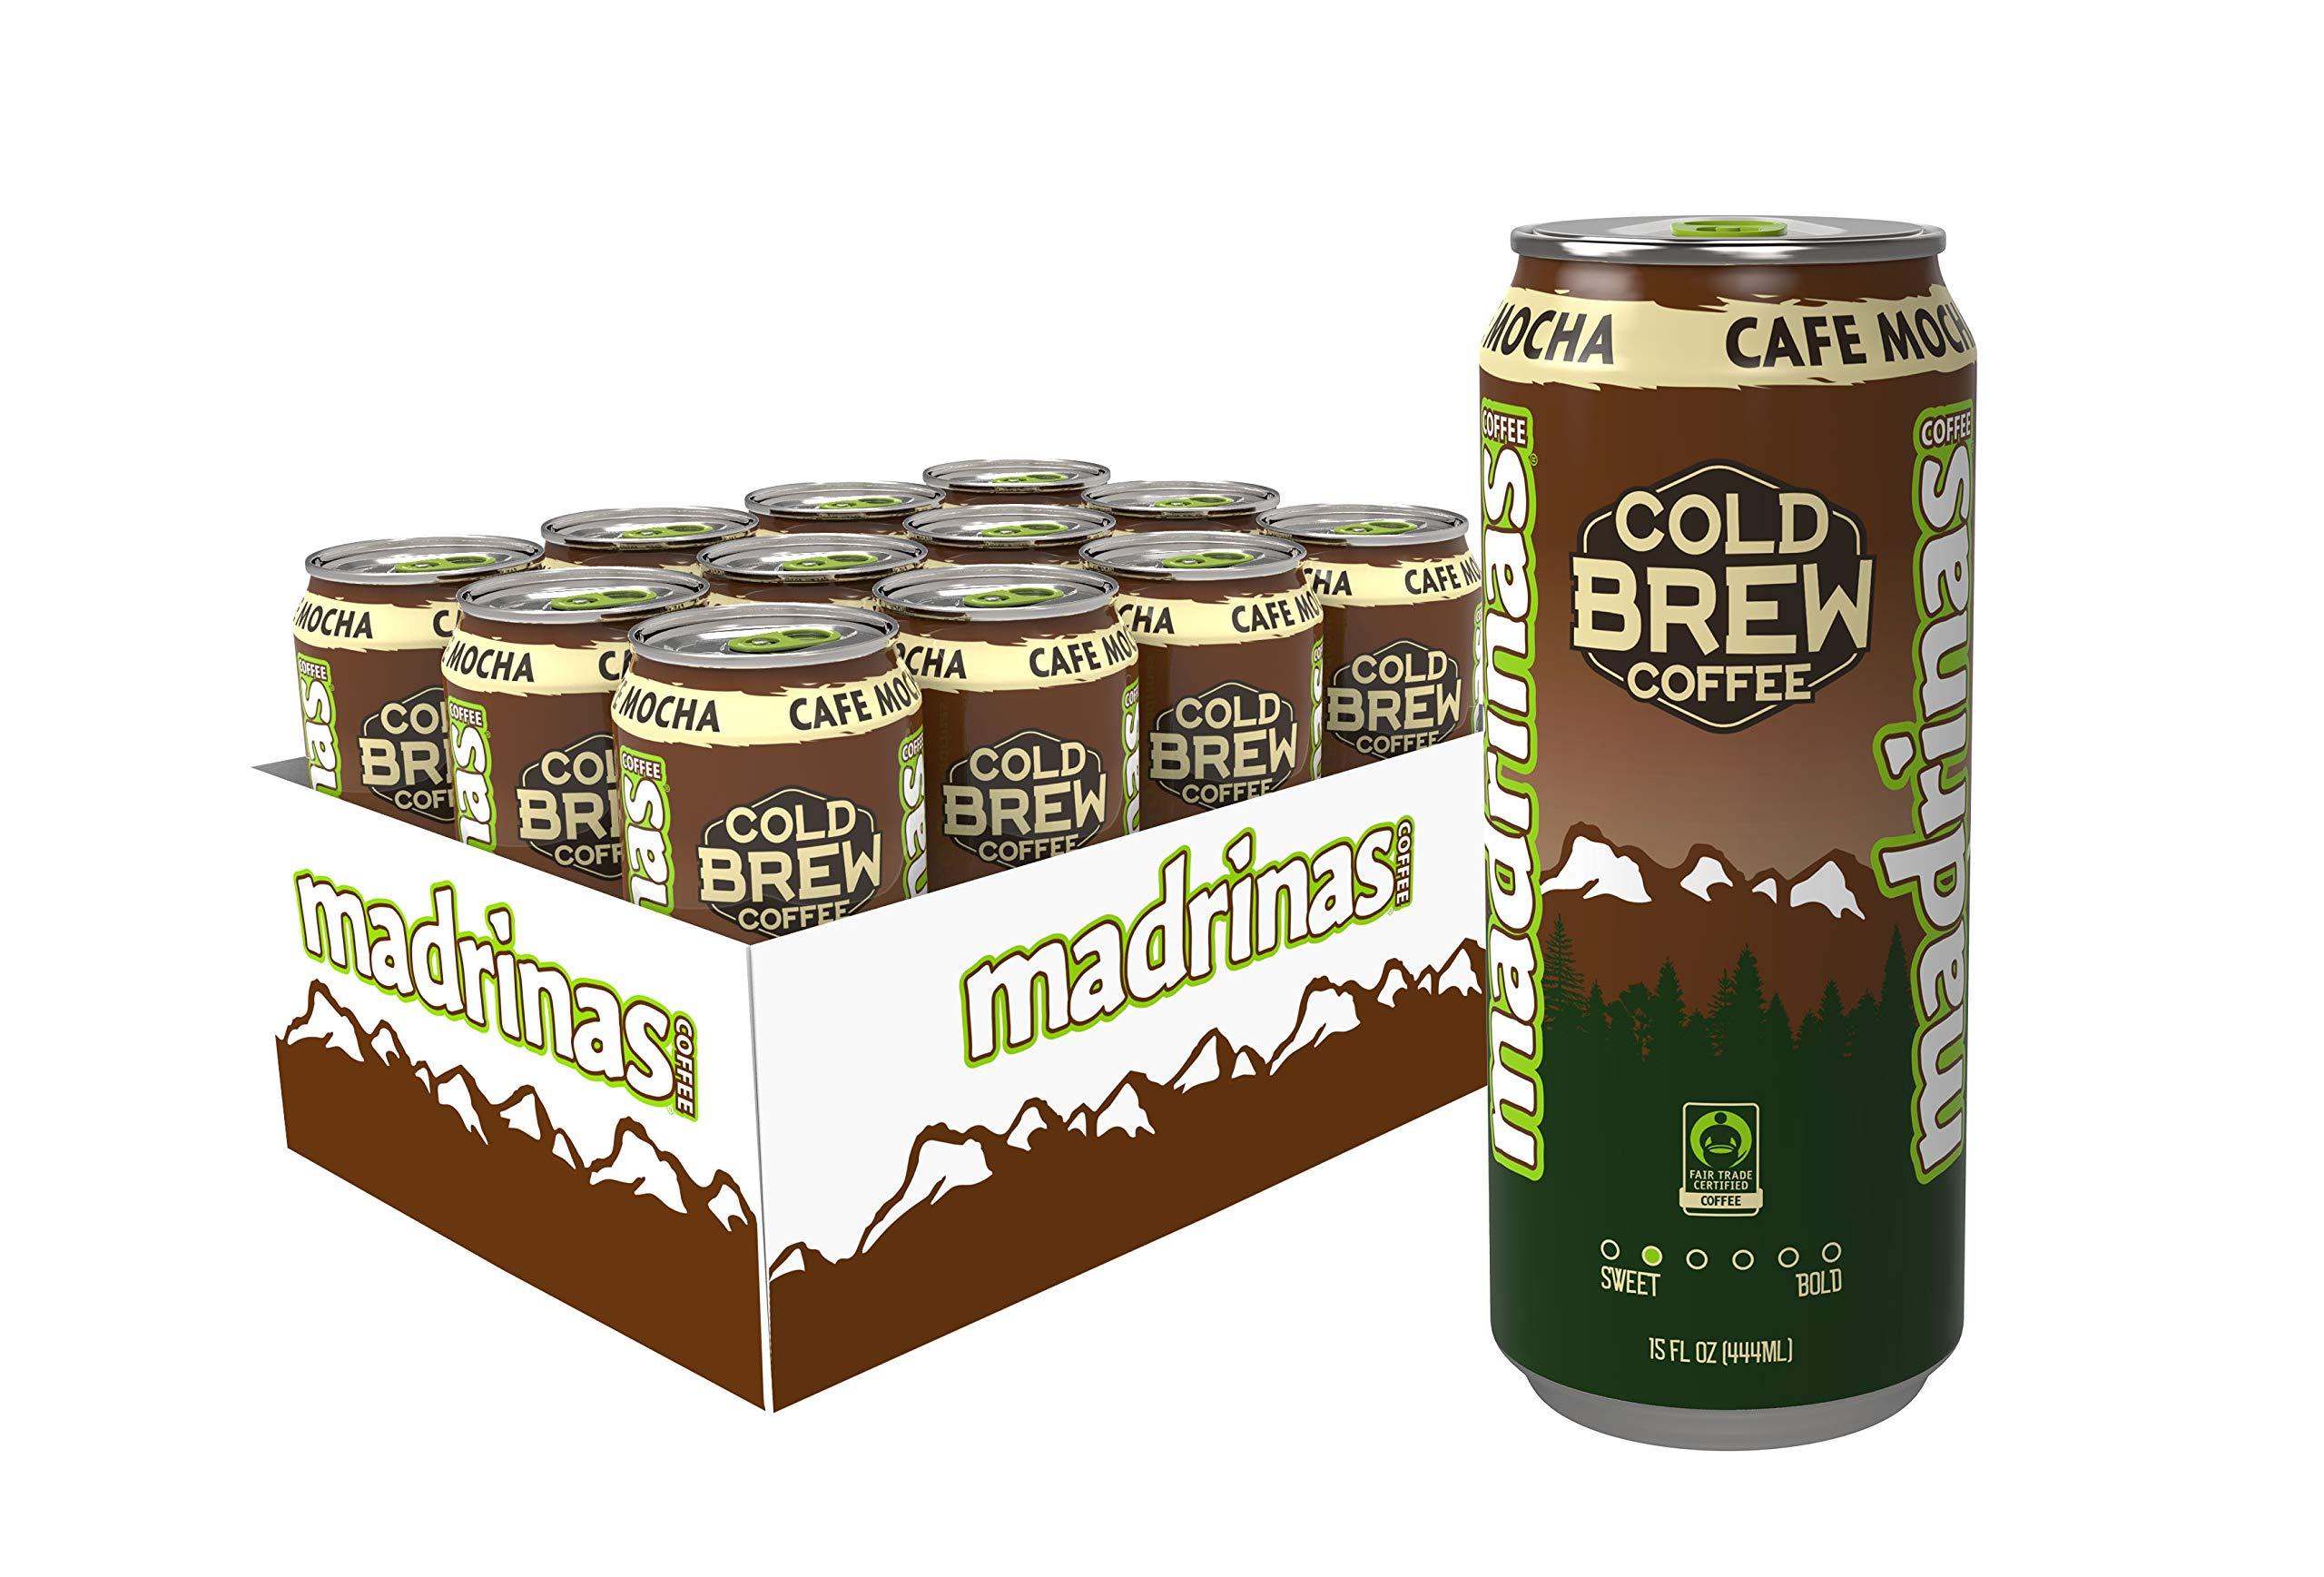 Madrinas Cafe Mocha Fair Trade Cold Brew Coffee, 15 Fl Oz (Pack of 12)